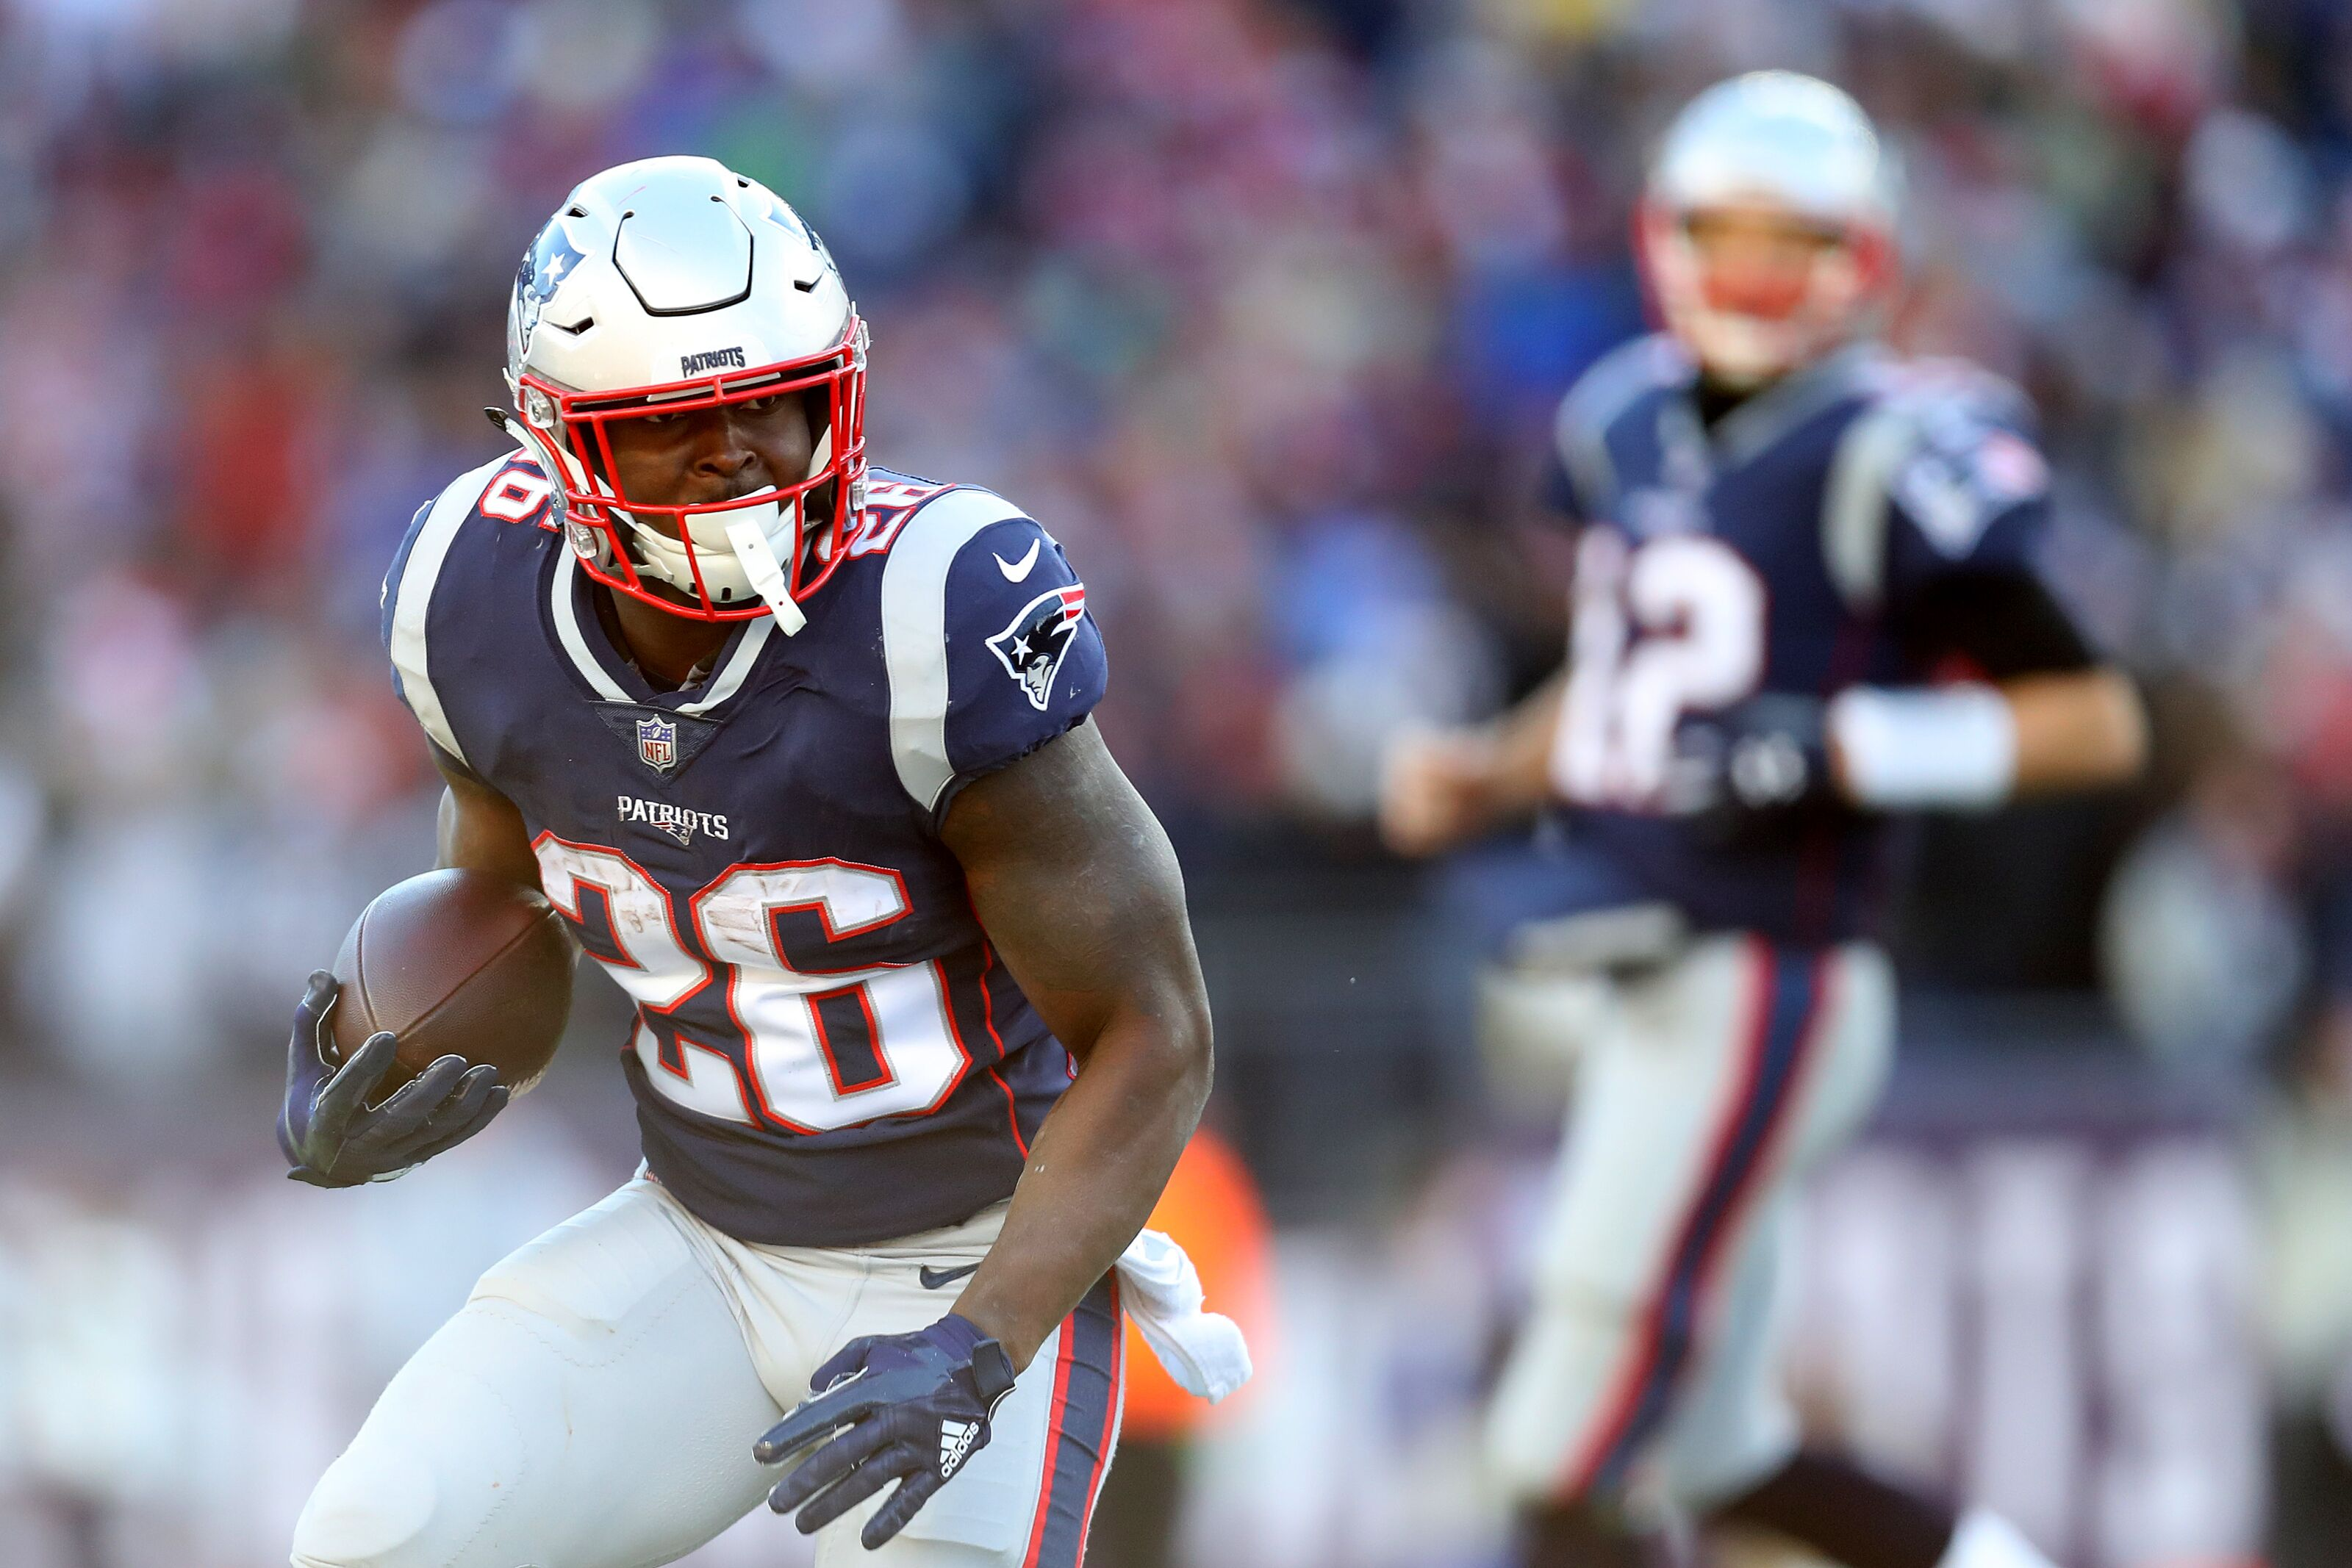 New England Patriots: Sony Michel fueling excitement entering second season